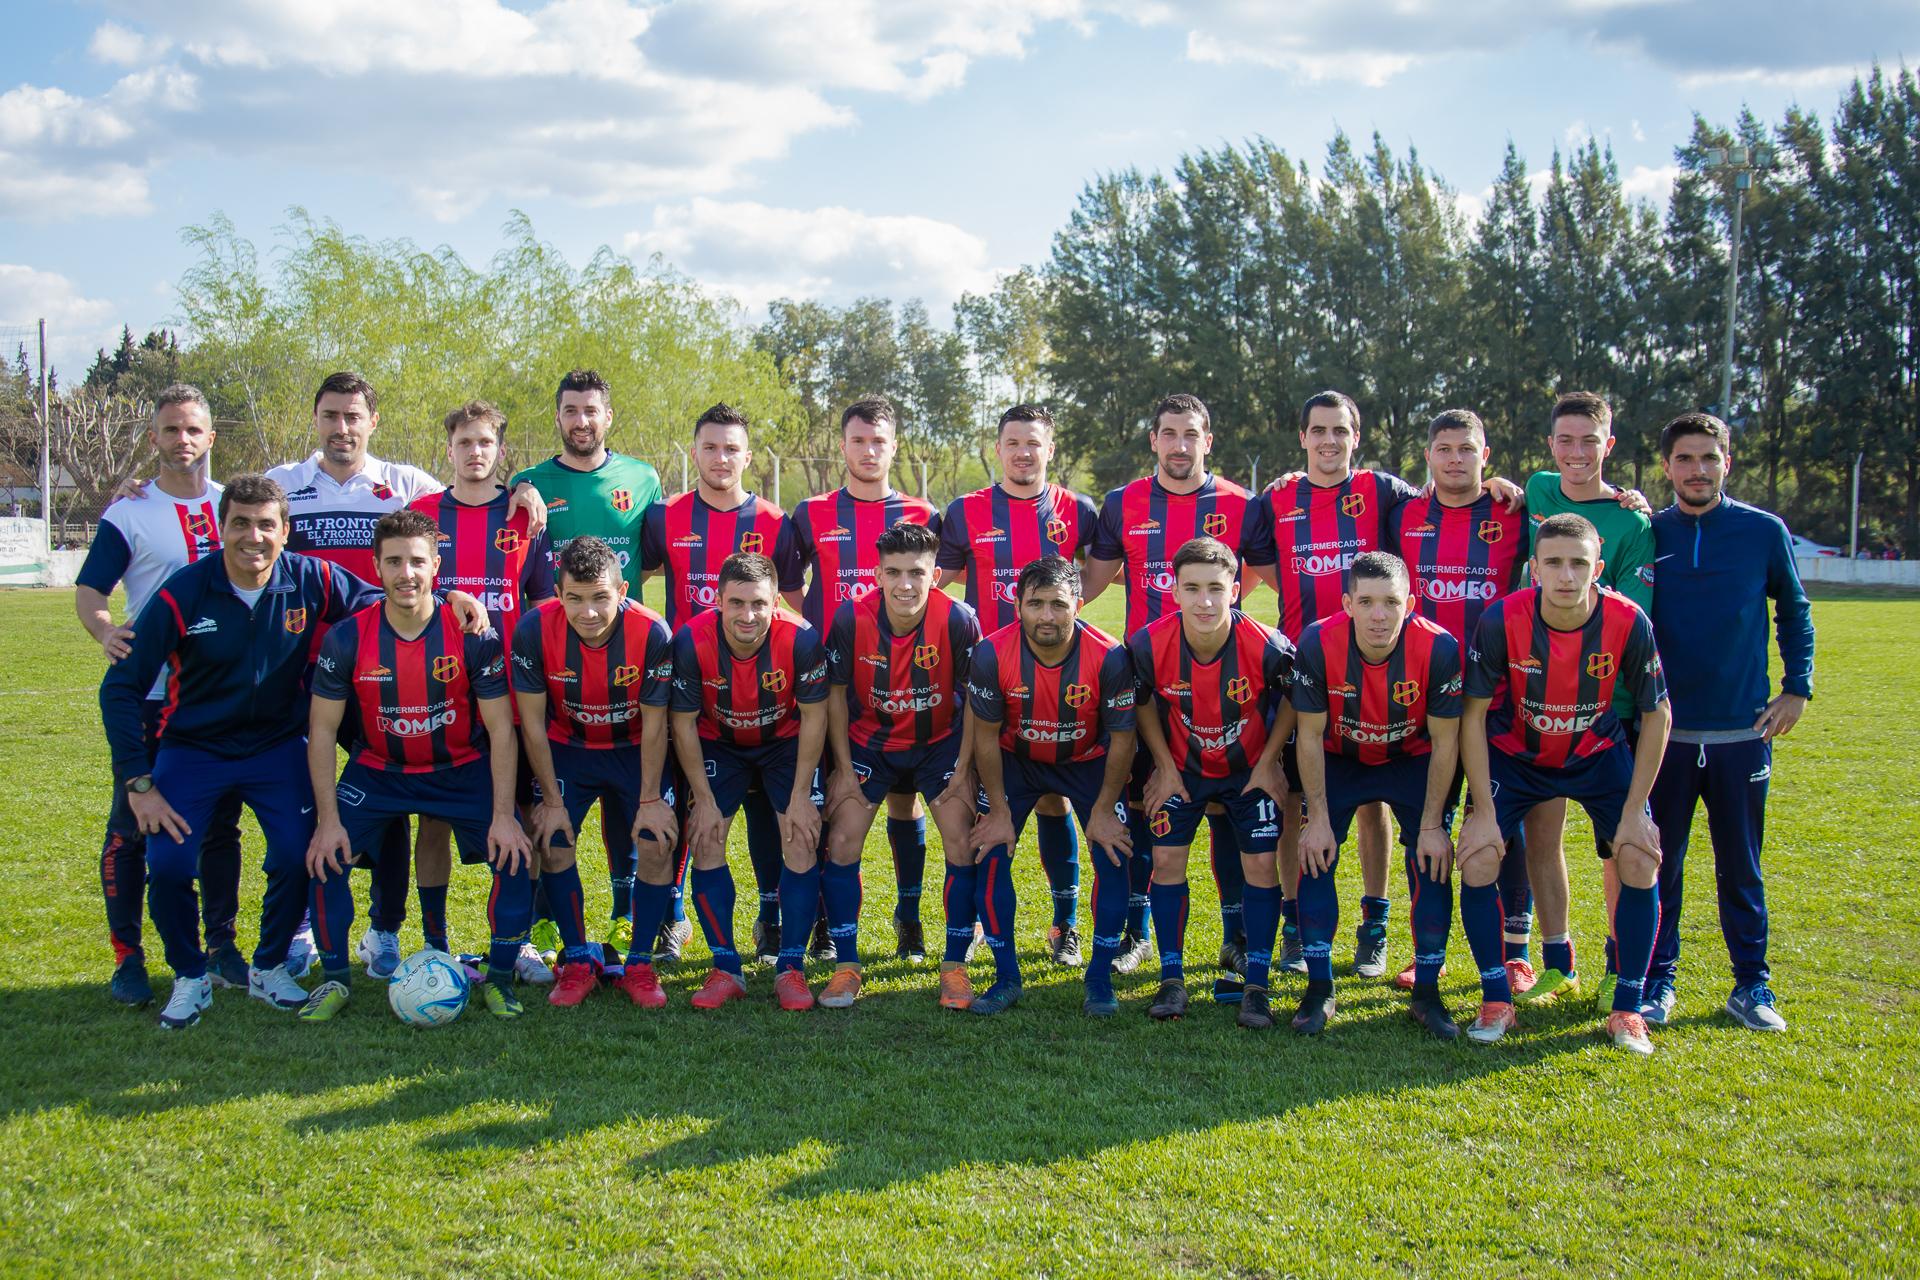 https://elfronton.club/wp-content/uploads/2019/09/plantel-primera-division-el-fronton.jpg